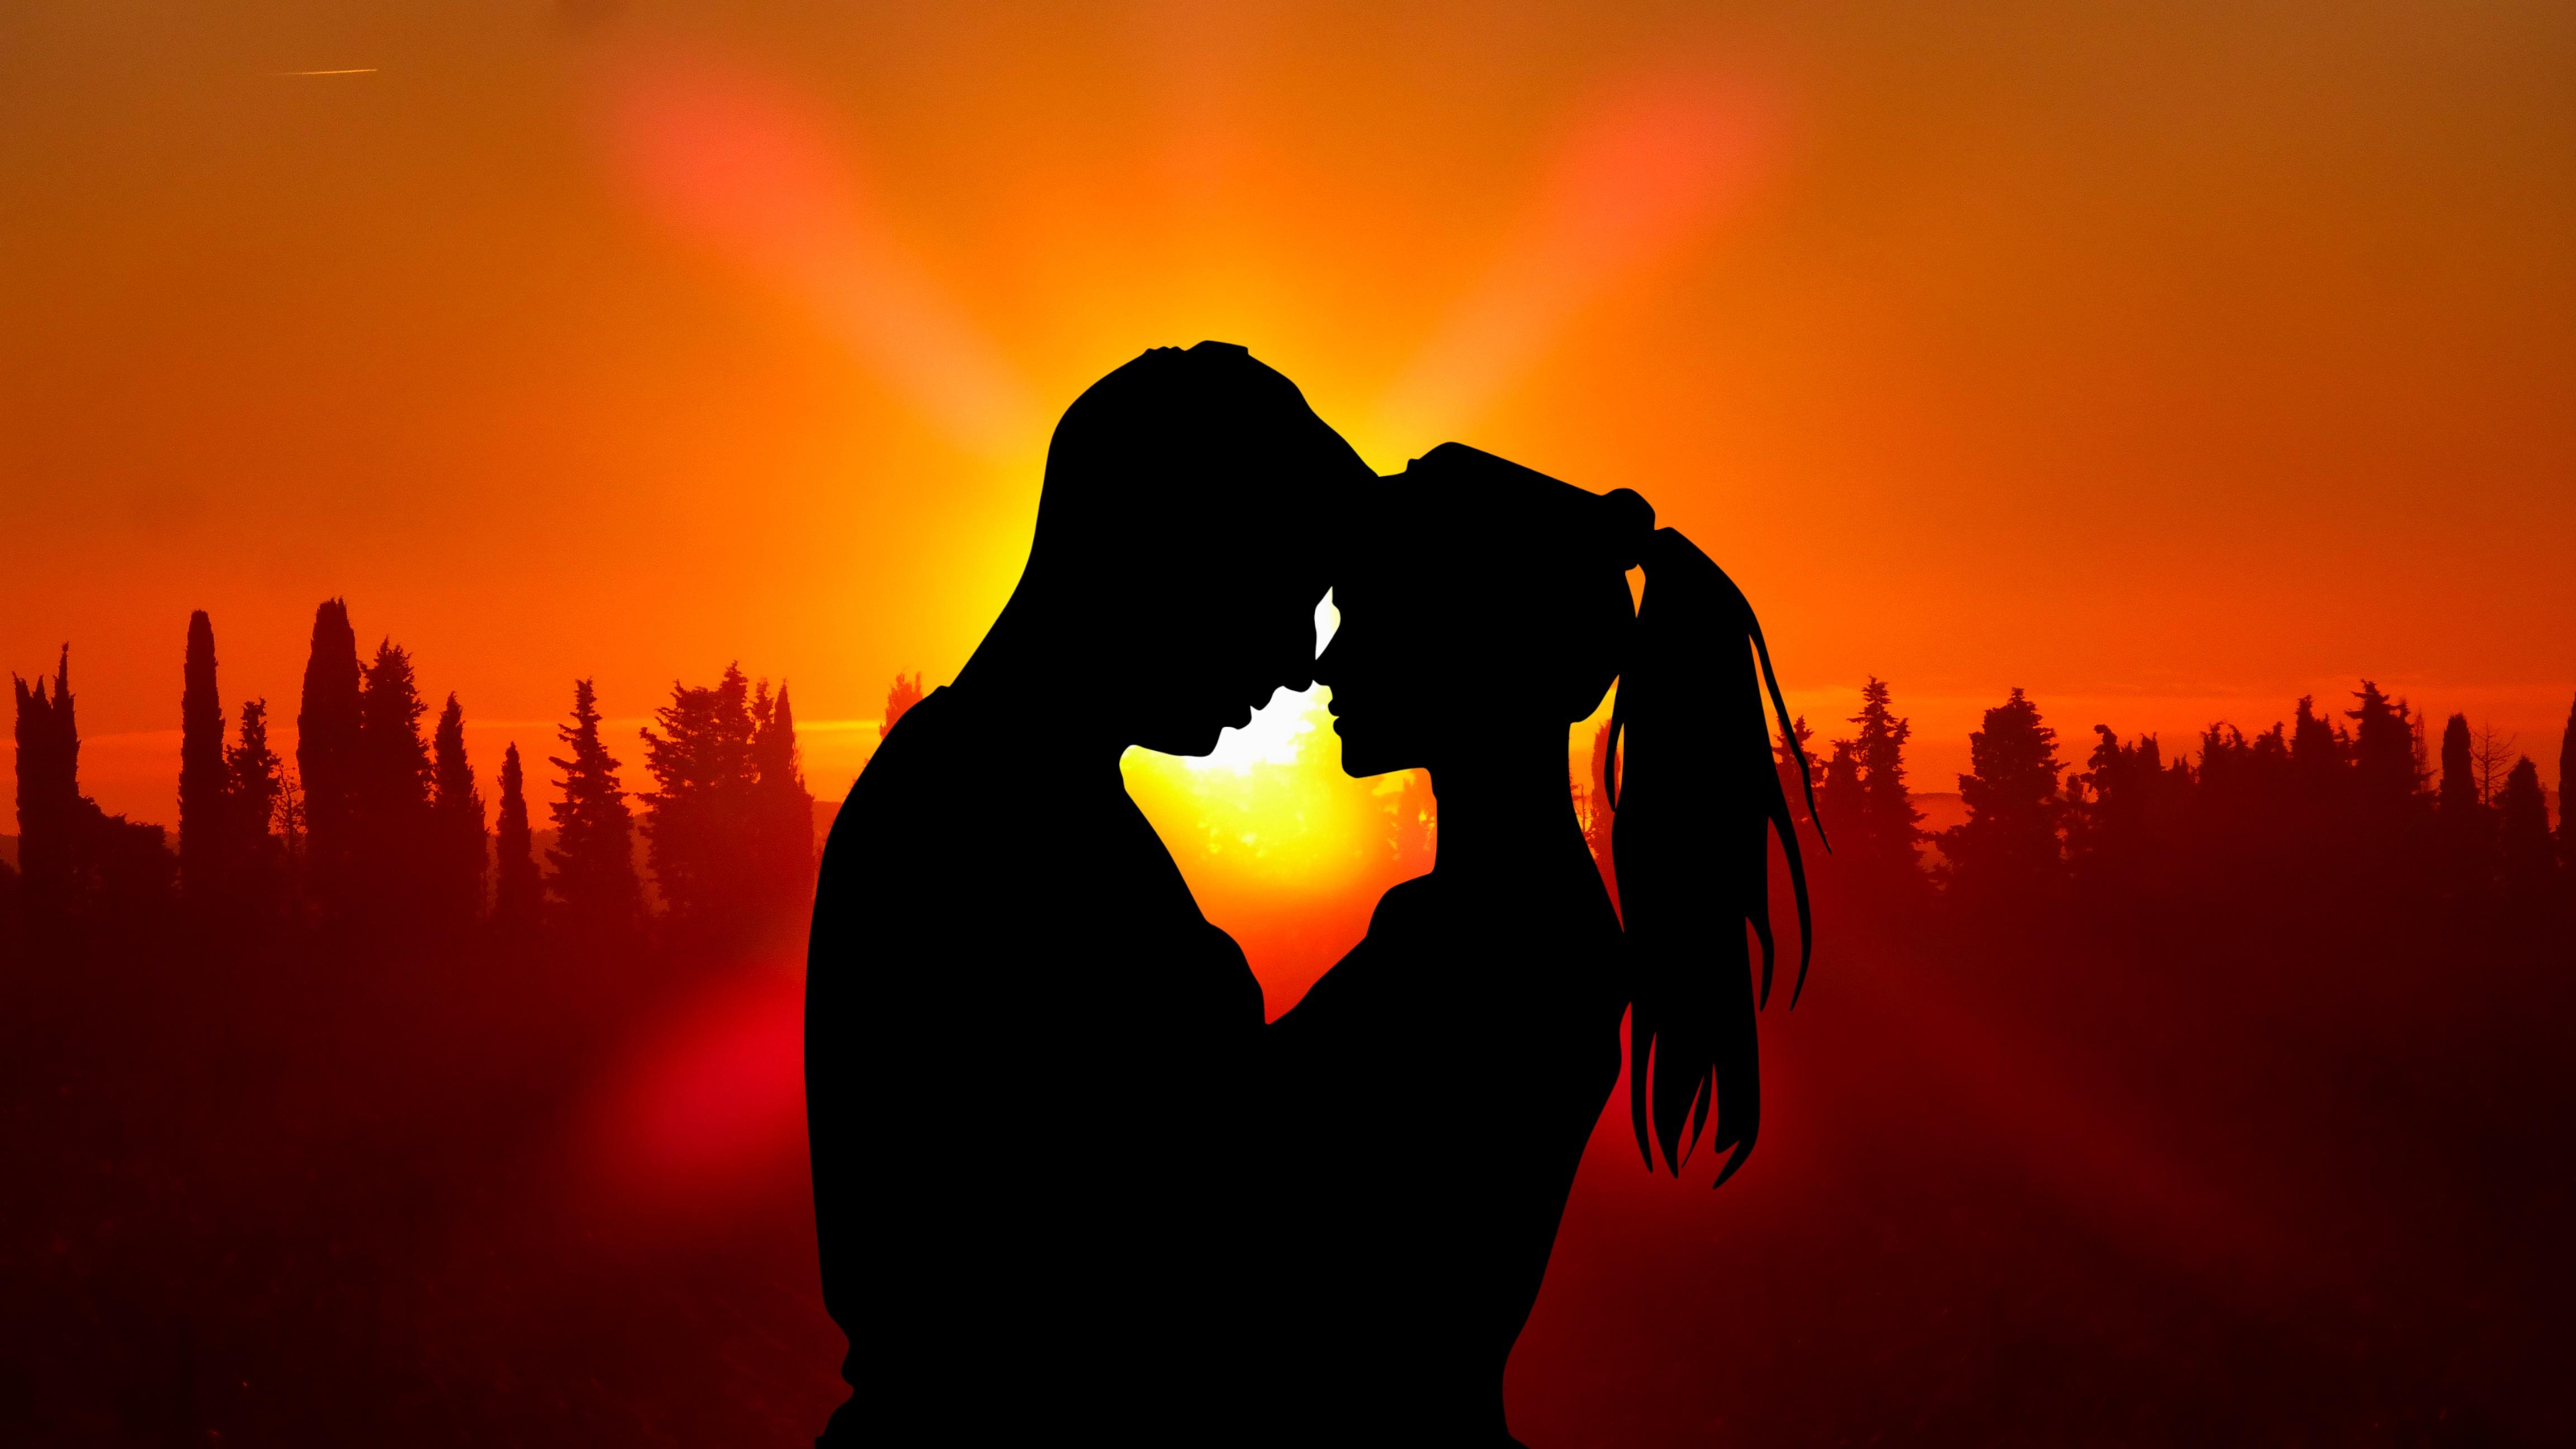 1920x1080 Sunset Couple Love Silhouette 5k Laptop Full HD ...